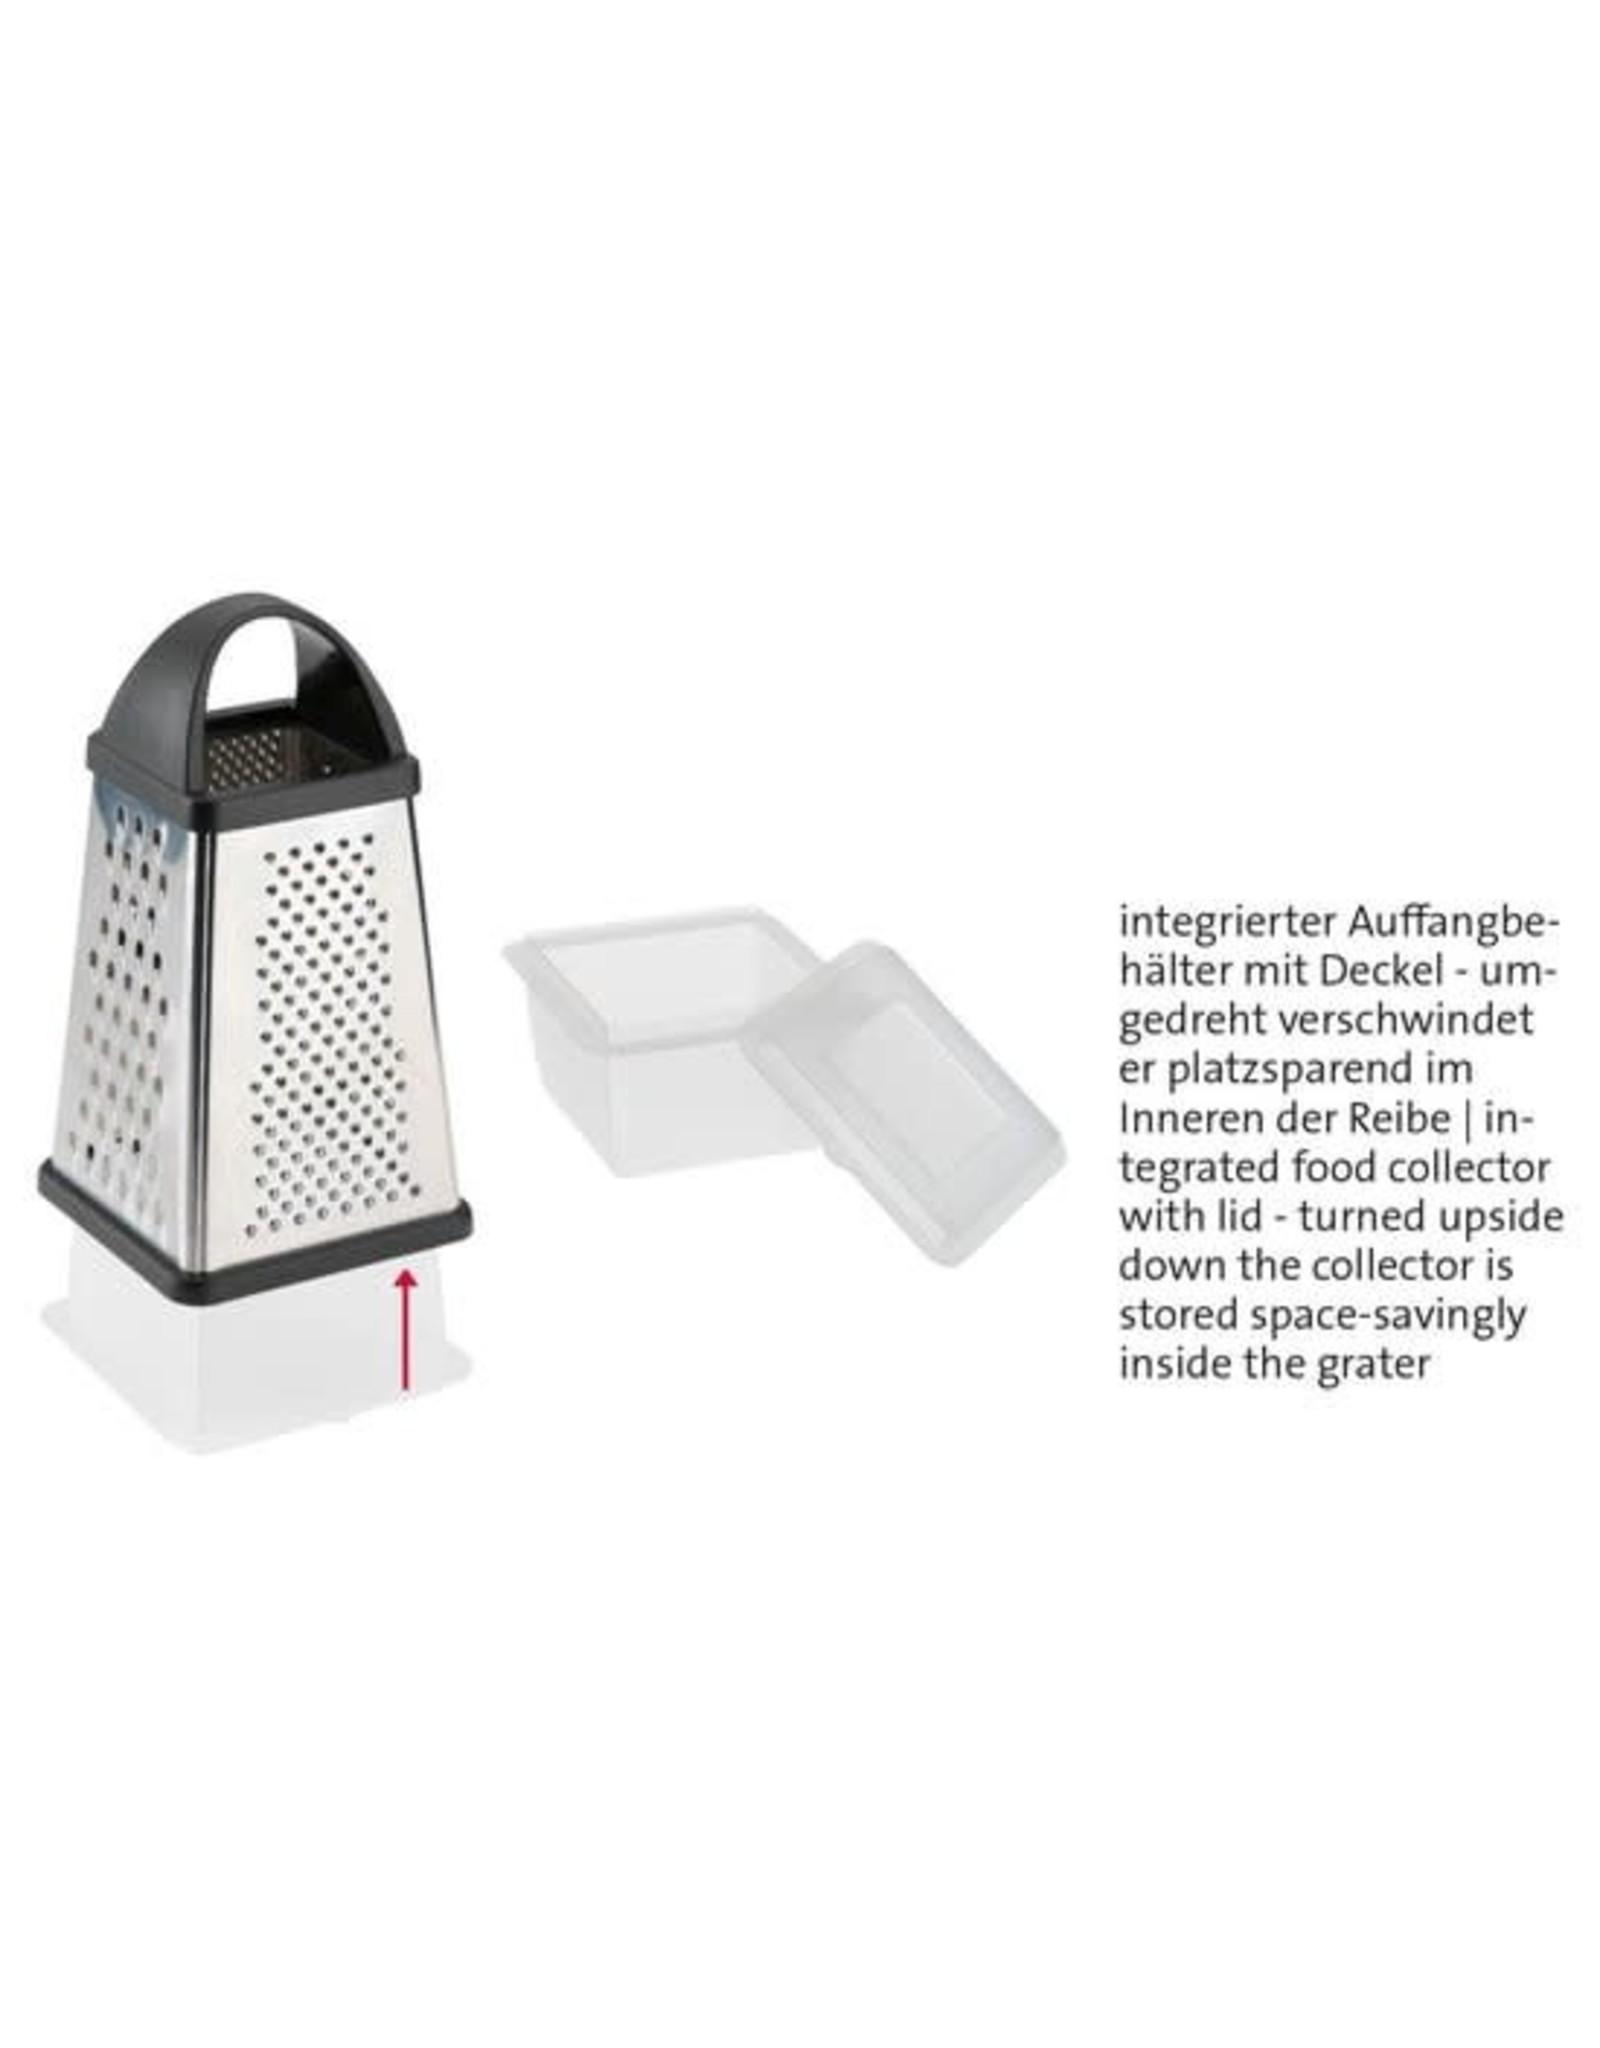 westmark Westmark Rasp 13 x 13,6 x 25 cm - Kunststof - RVS Inclusief opvangbak